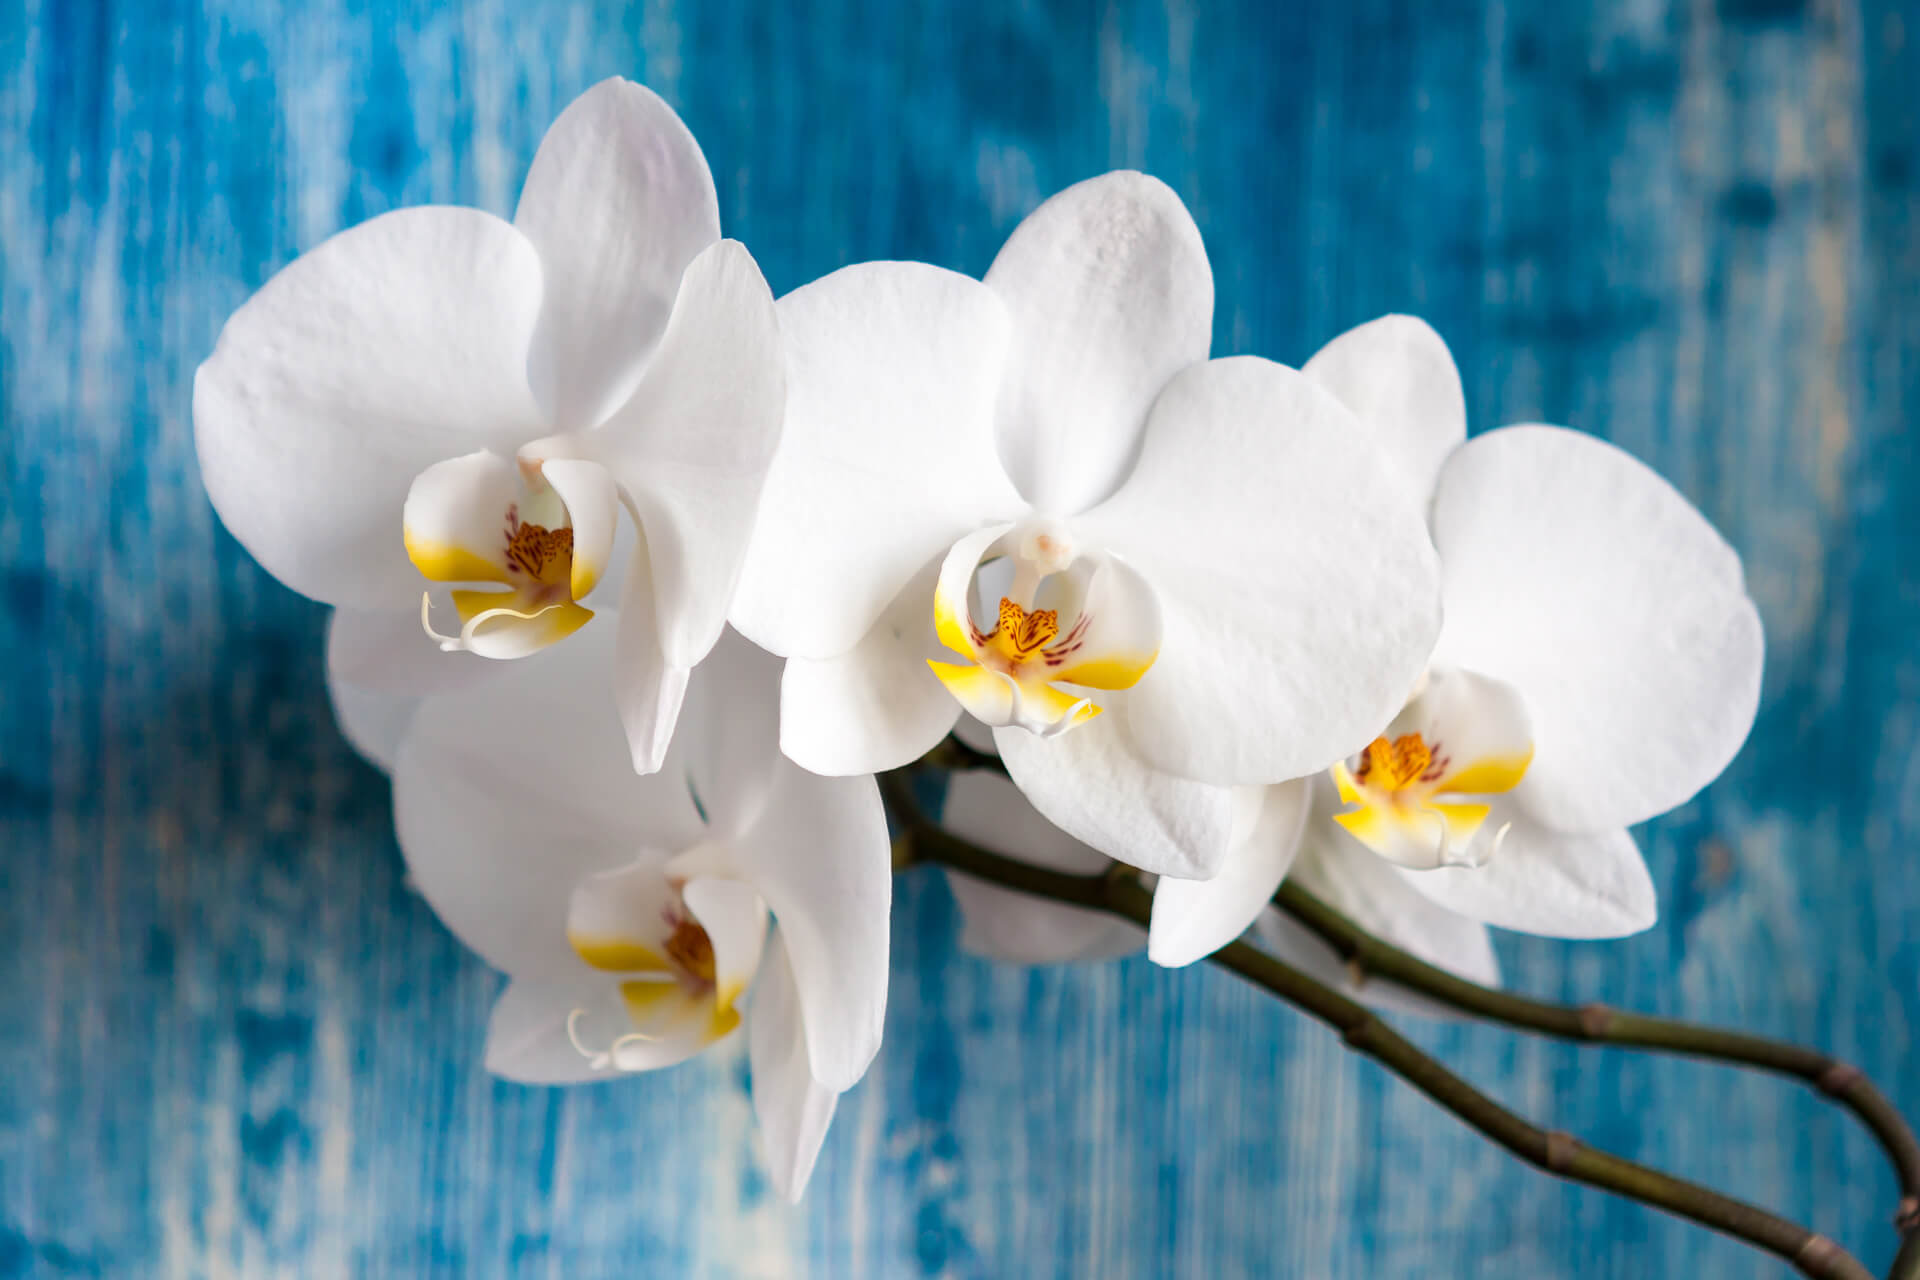 finestre-esposte-a-est-orchidee